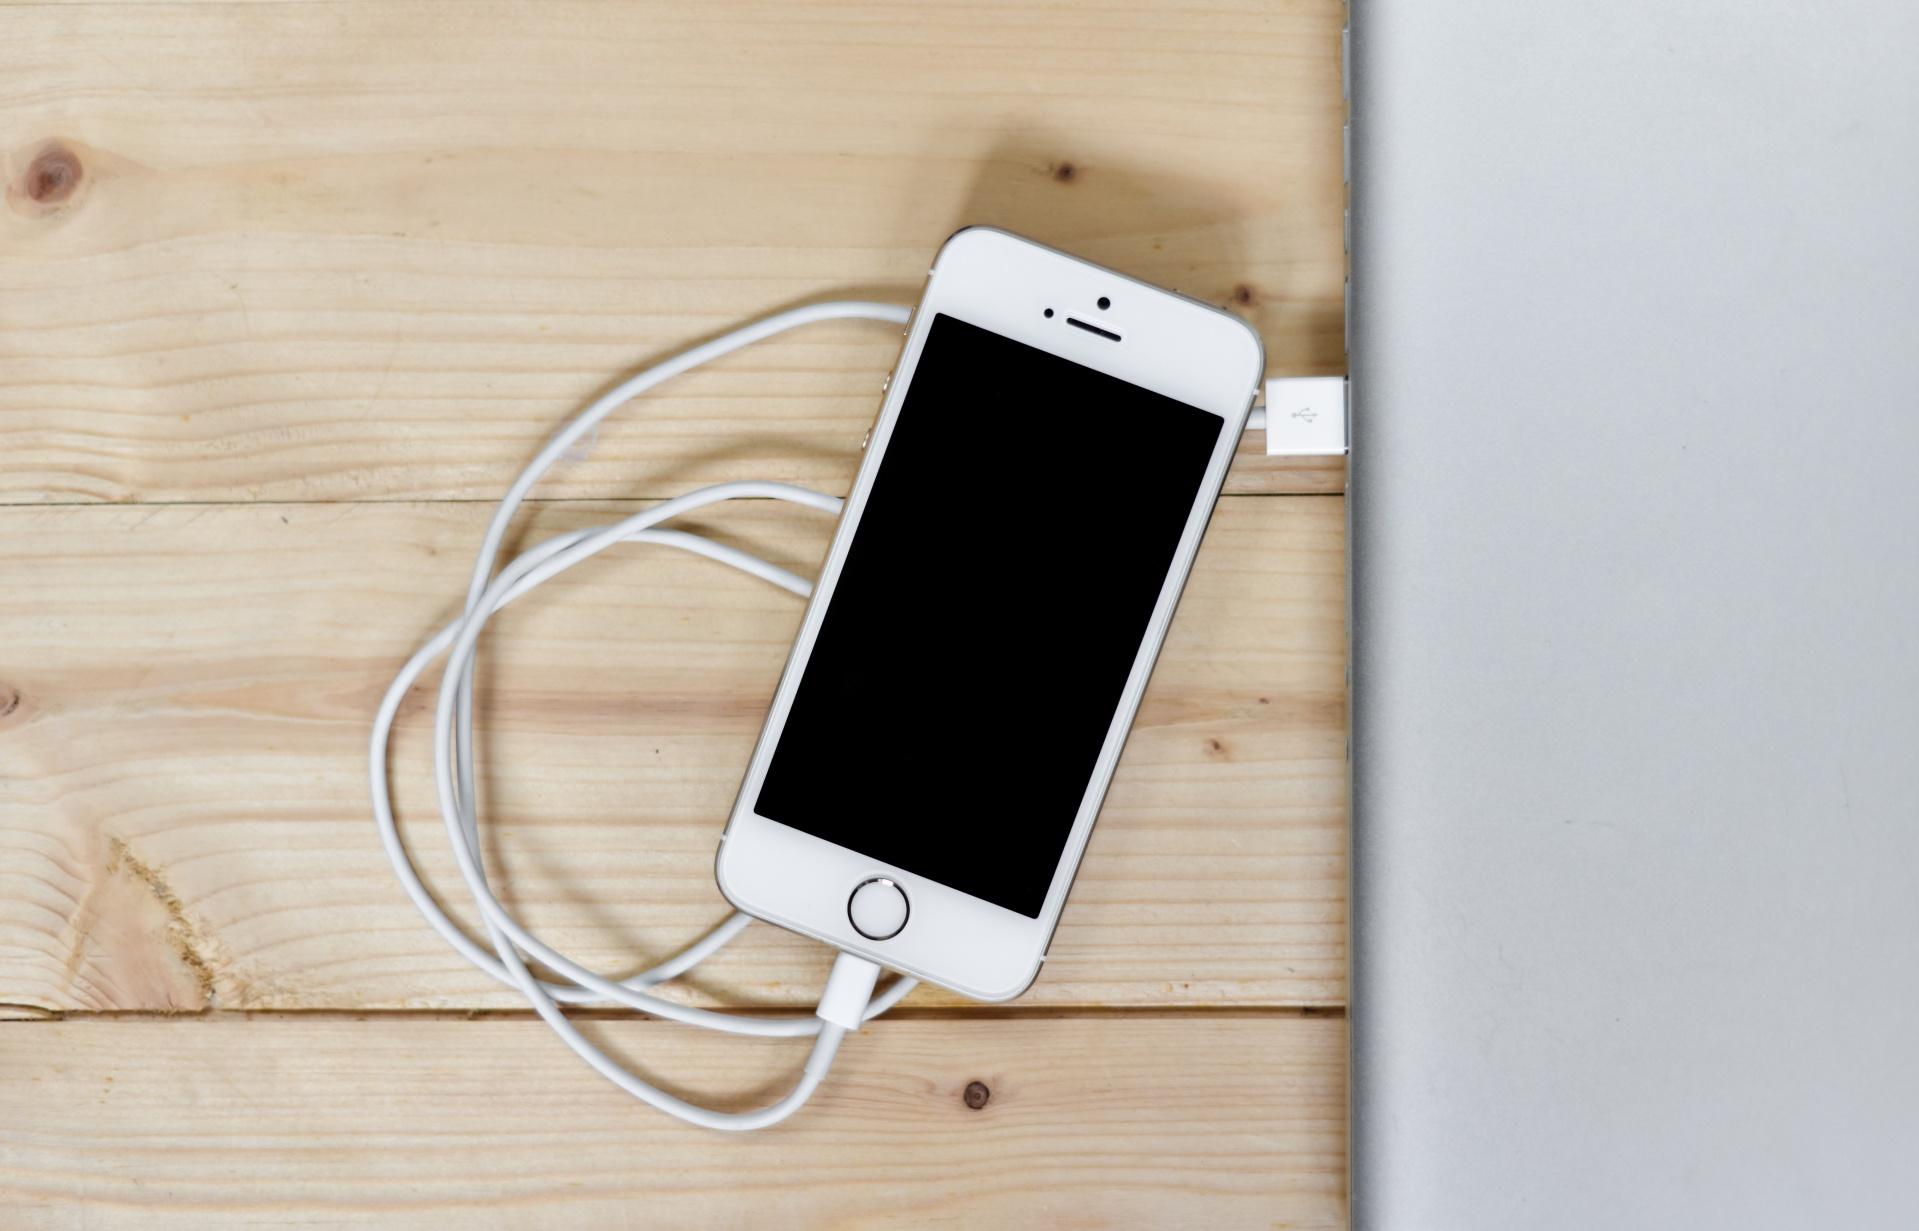 3uTools iPhone